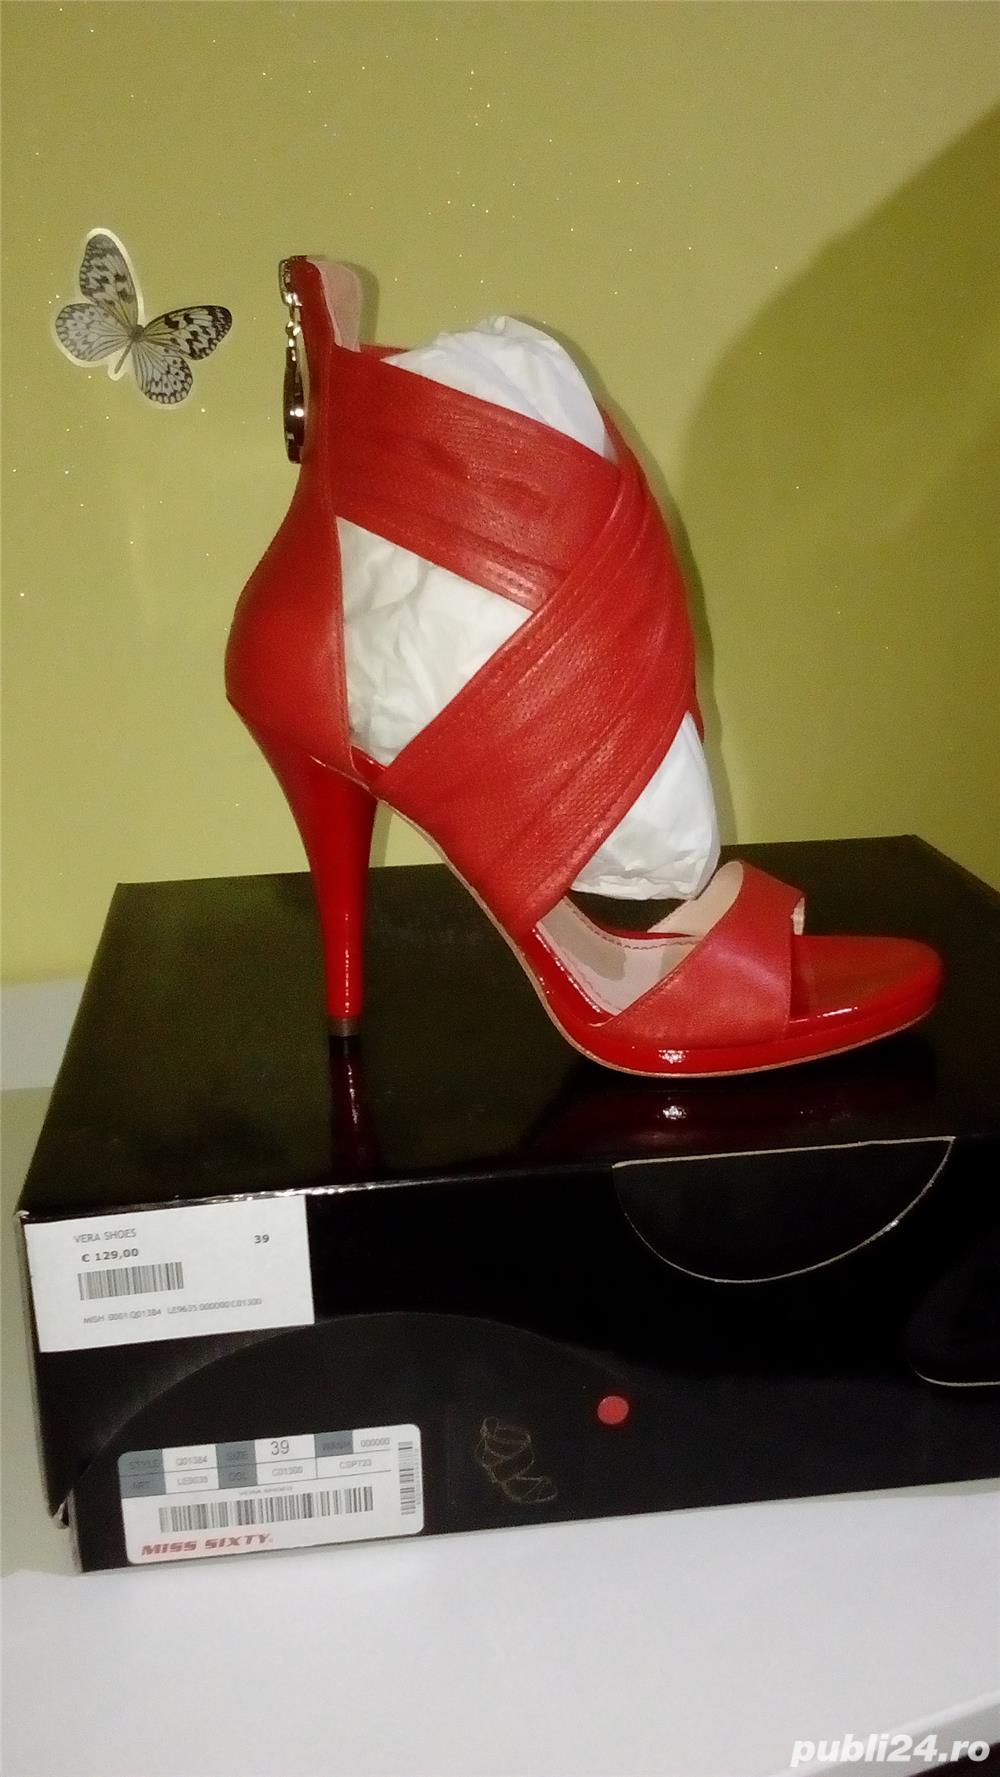 Sandale Miss Sixty noi din piele naturala 39